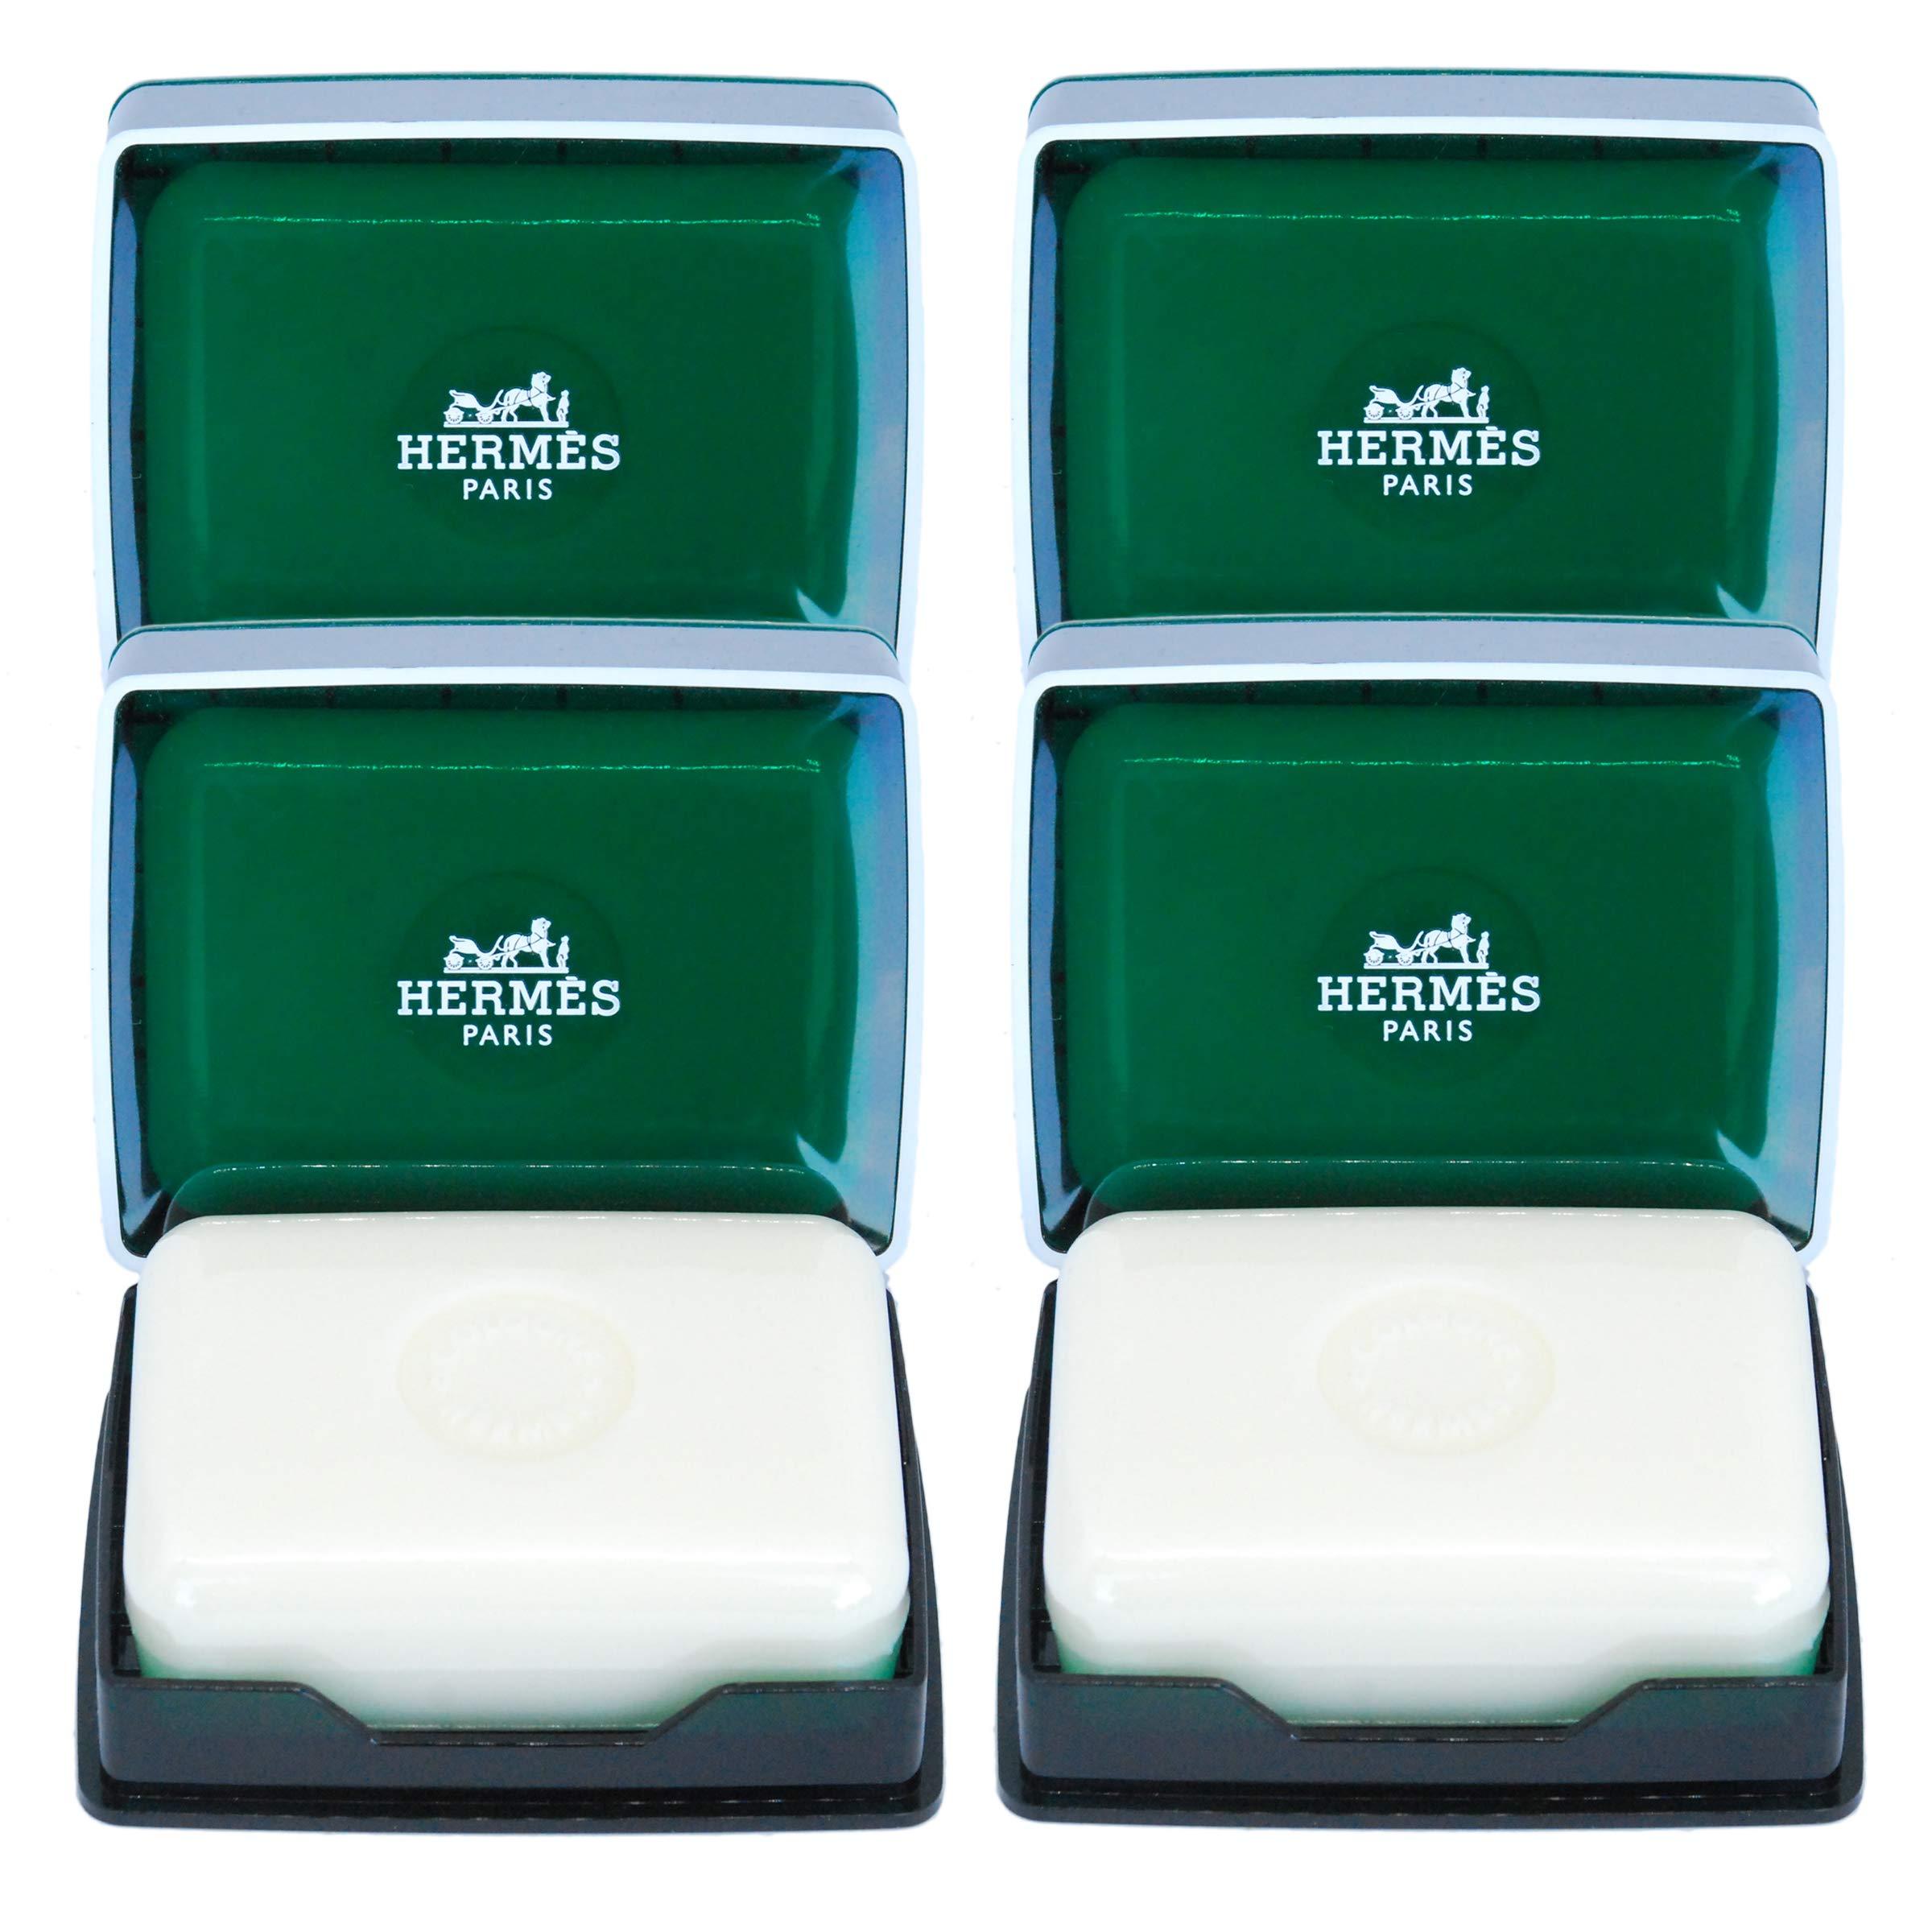 Four (4) Hermès Eau d'Orange Verte Luxury Gift Boxed 3.5 Ounce Savons Parfume/Perfumed Gift Soaps In Bubble Bag - Total 14 Ounces / 400 Grams